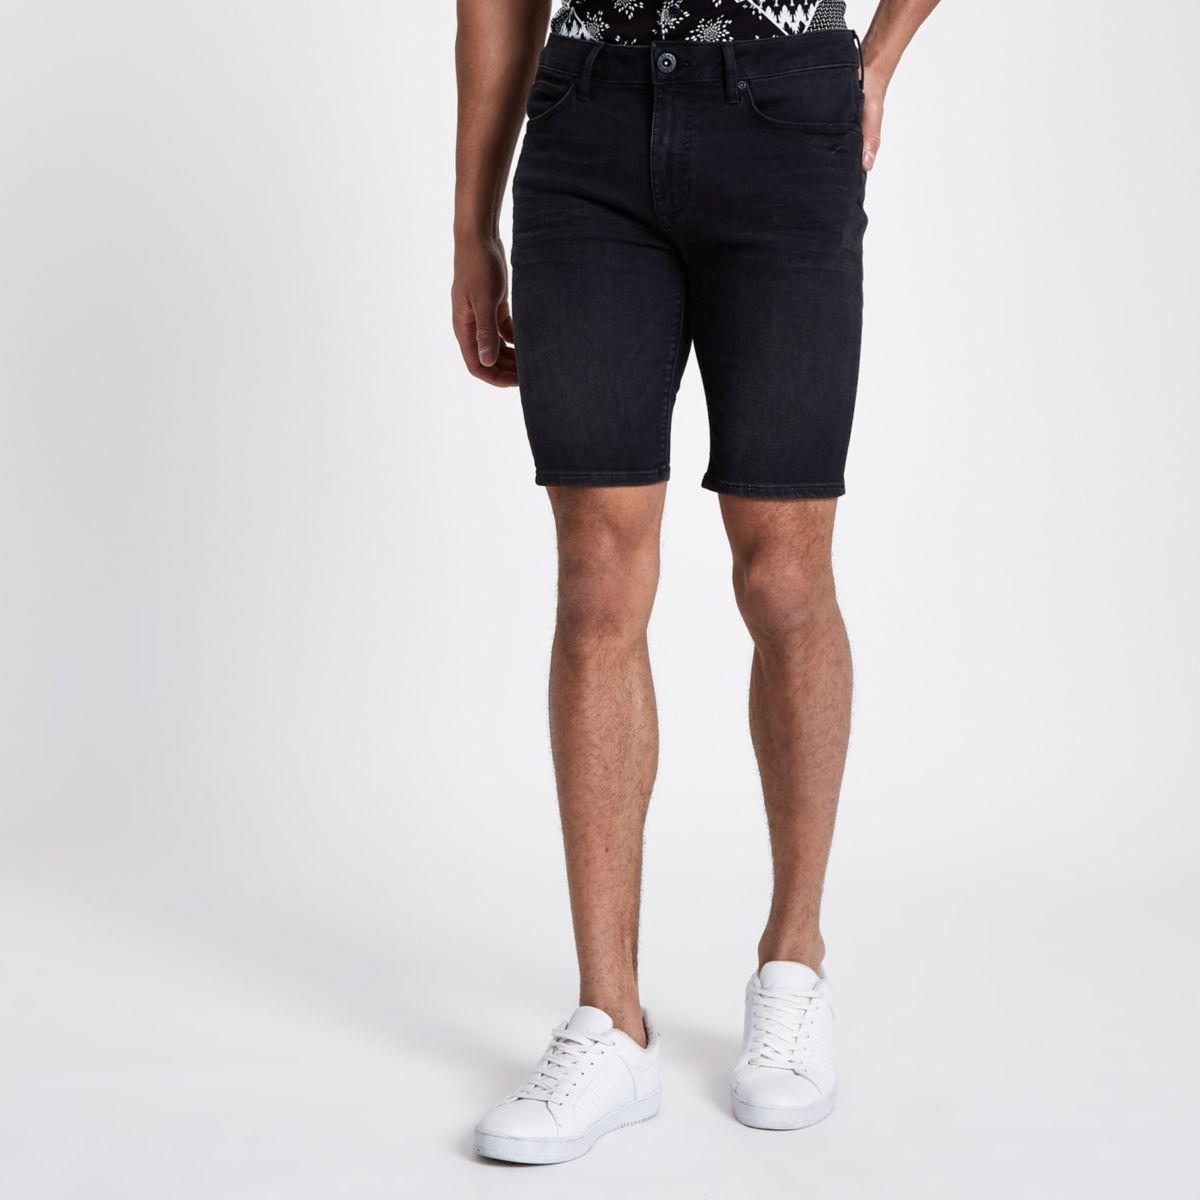 Ollie – Schwarze Skinny Shorts